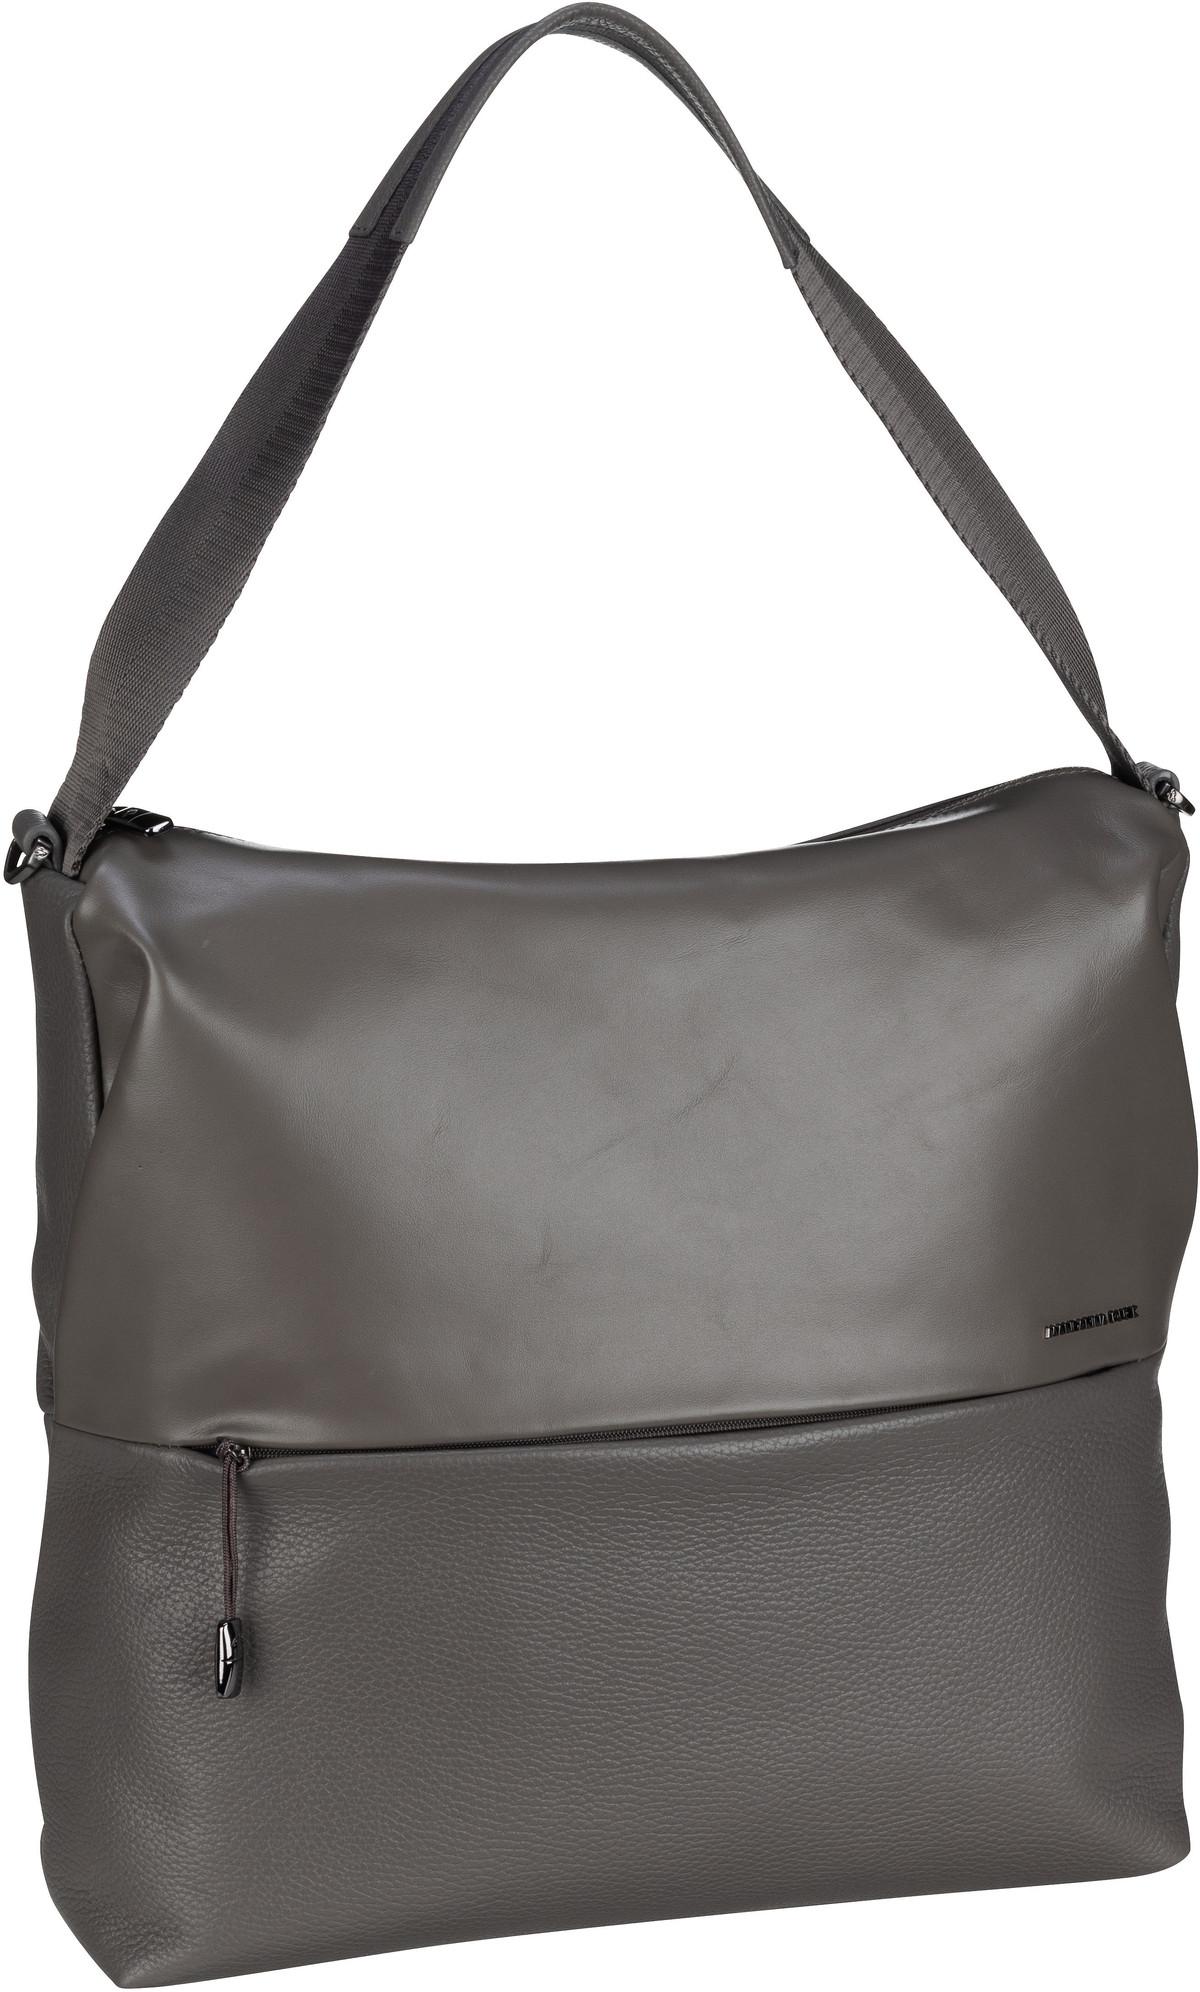 mandarina duck -  Handtasche Athena Medium Hobo UPT05 Soldier